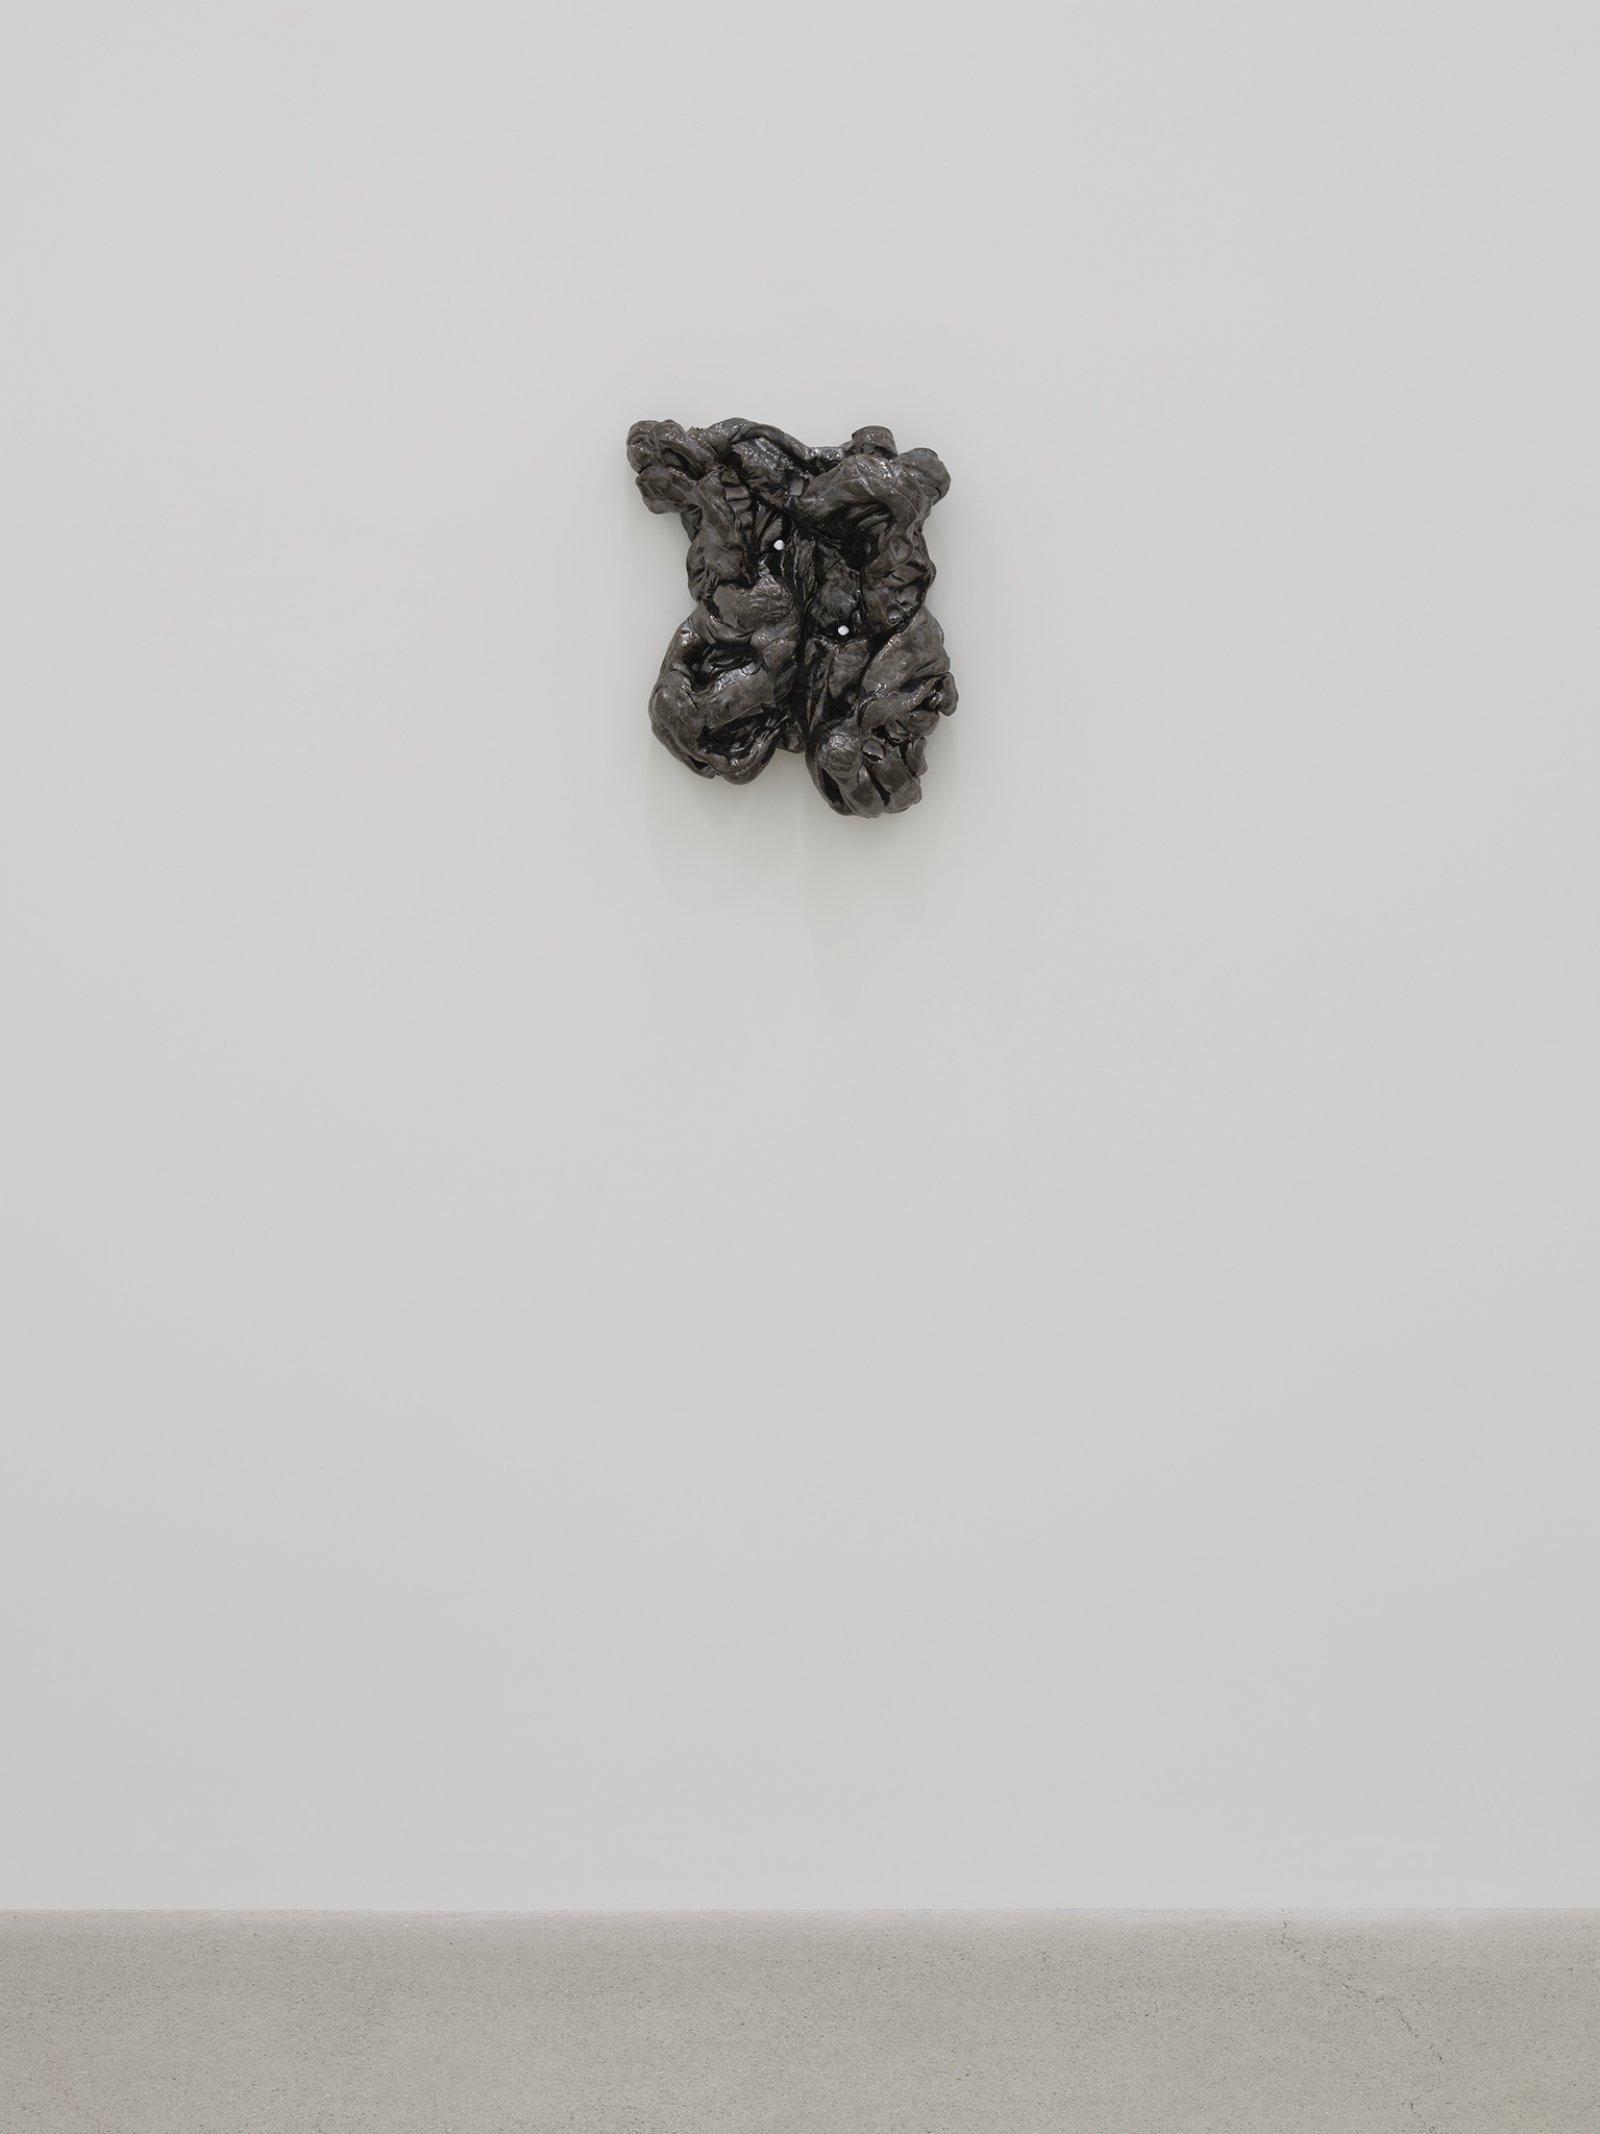 Rochelle Goldberg, Composite Contact IV, 2019, glazed ceramic, nails, 14 x 13 x 5 in. (36 x 33 x 13 cm) by Rochelle Goldberg